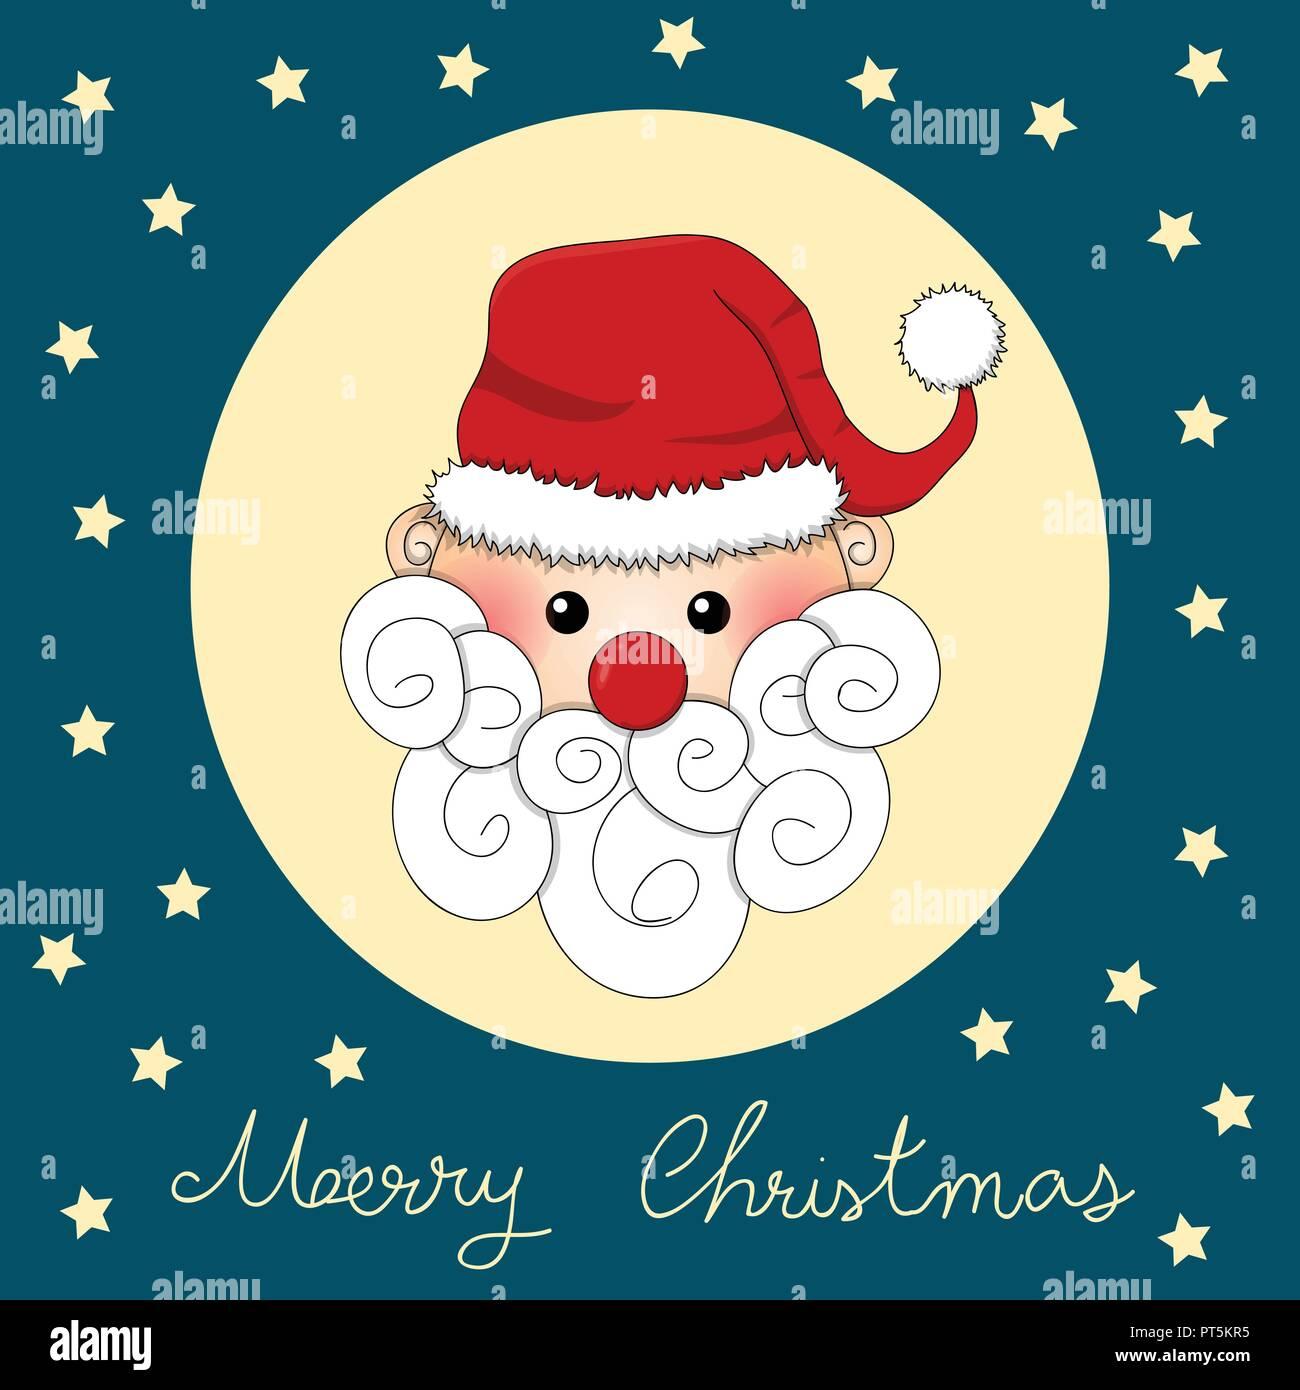 Santa Claus On Indigo Blue Christmas Greeting Card Vector